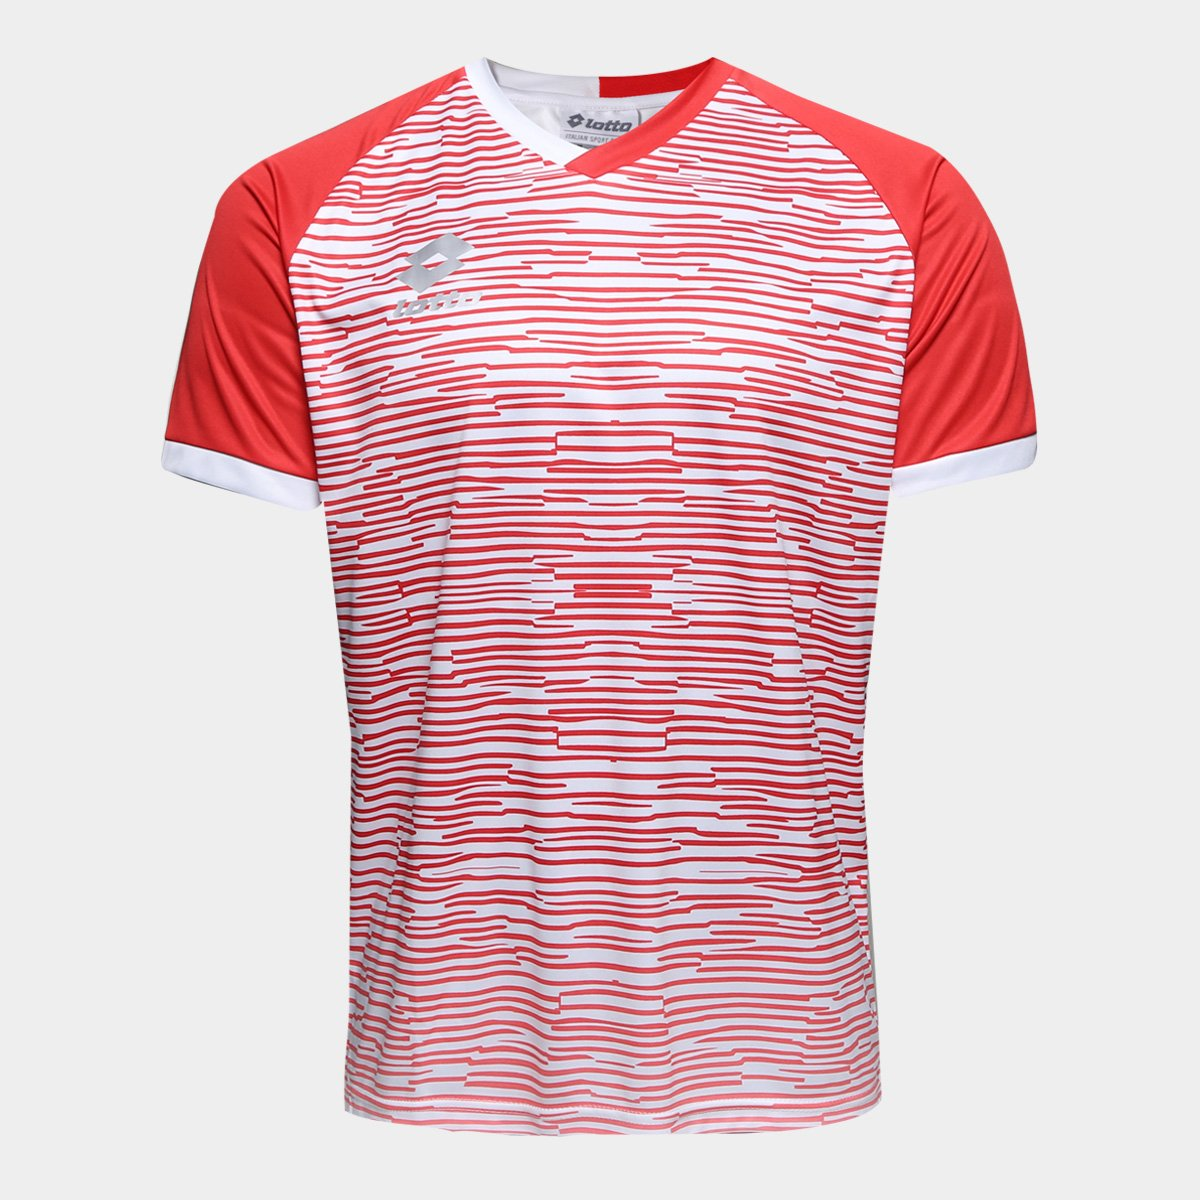 dae0afe0d Camiseta Lotto Vibrant Masculina - Compre Agora